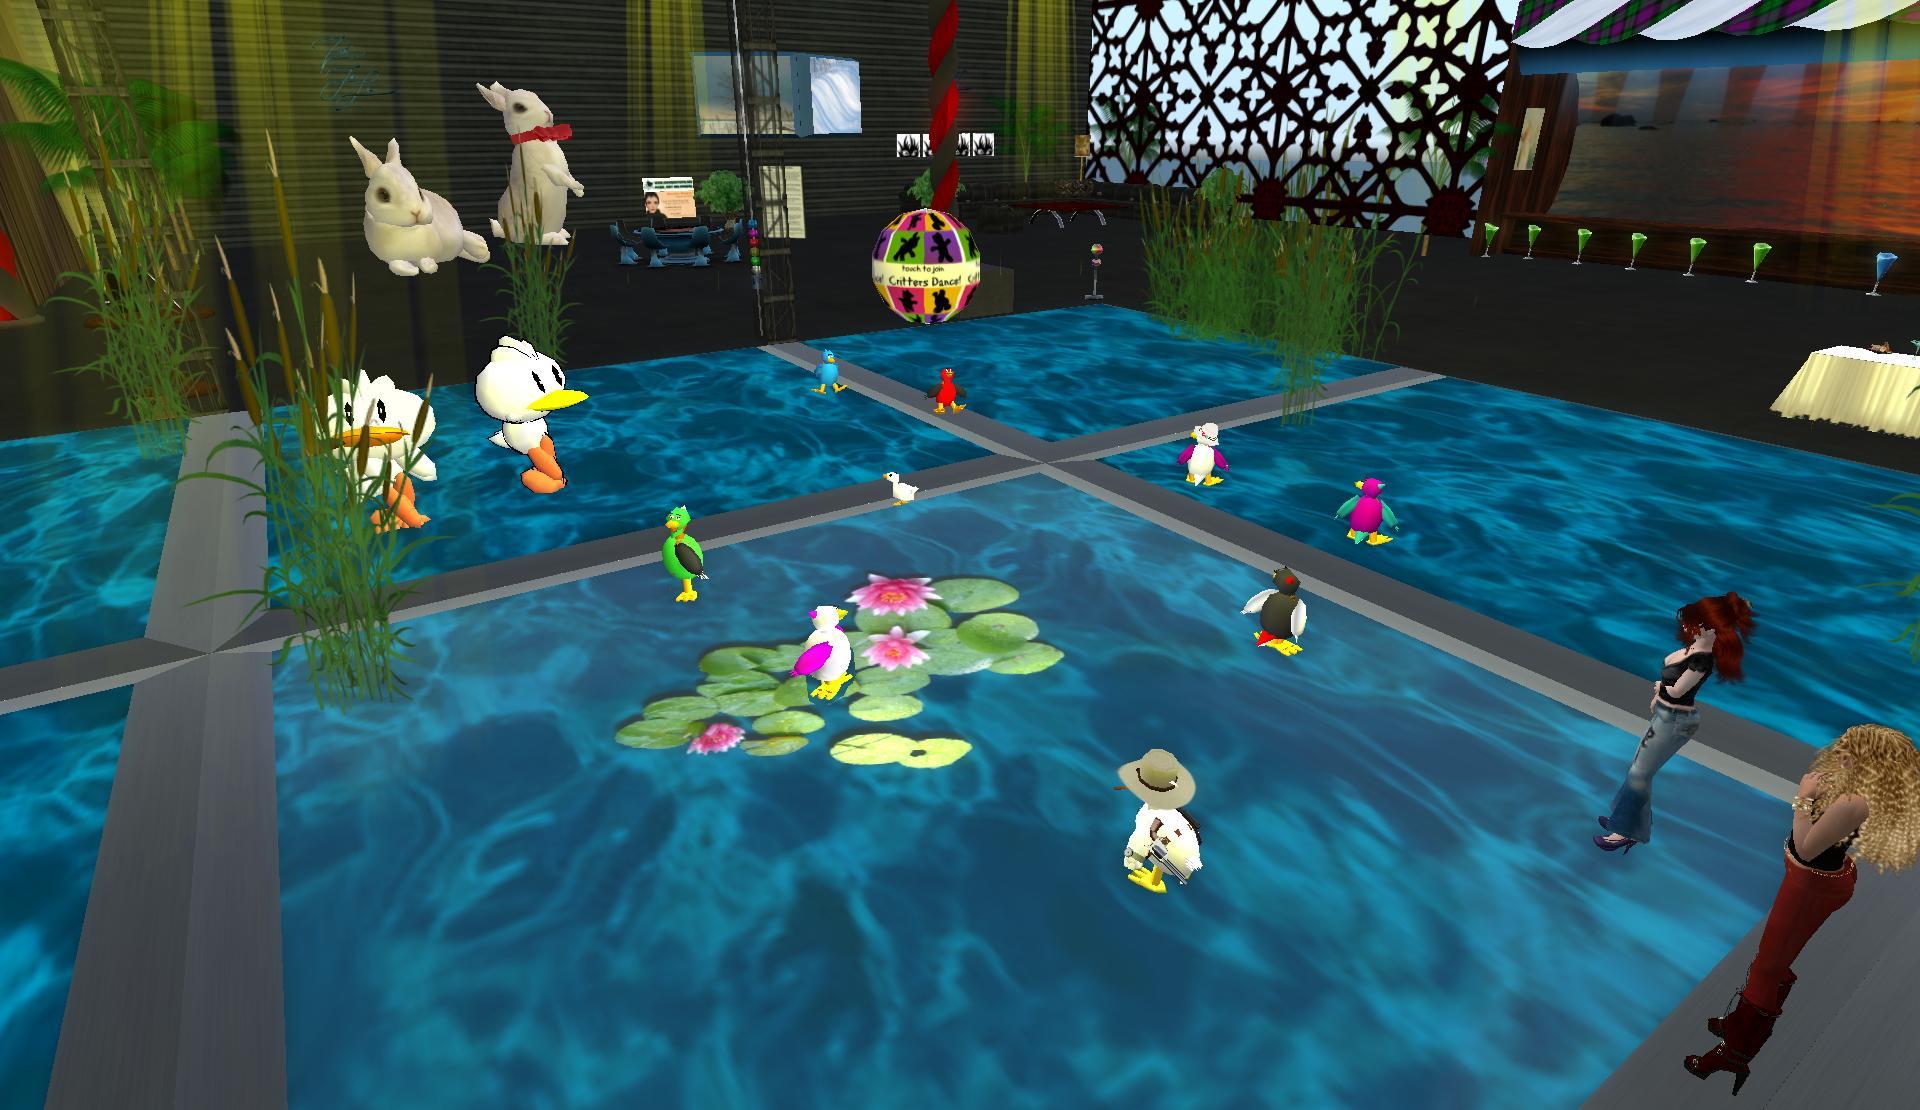 a-duck-dance-floor-is-a-pond